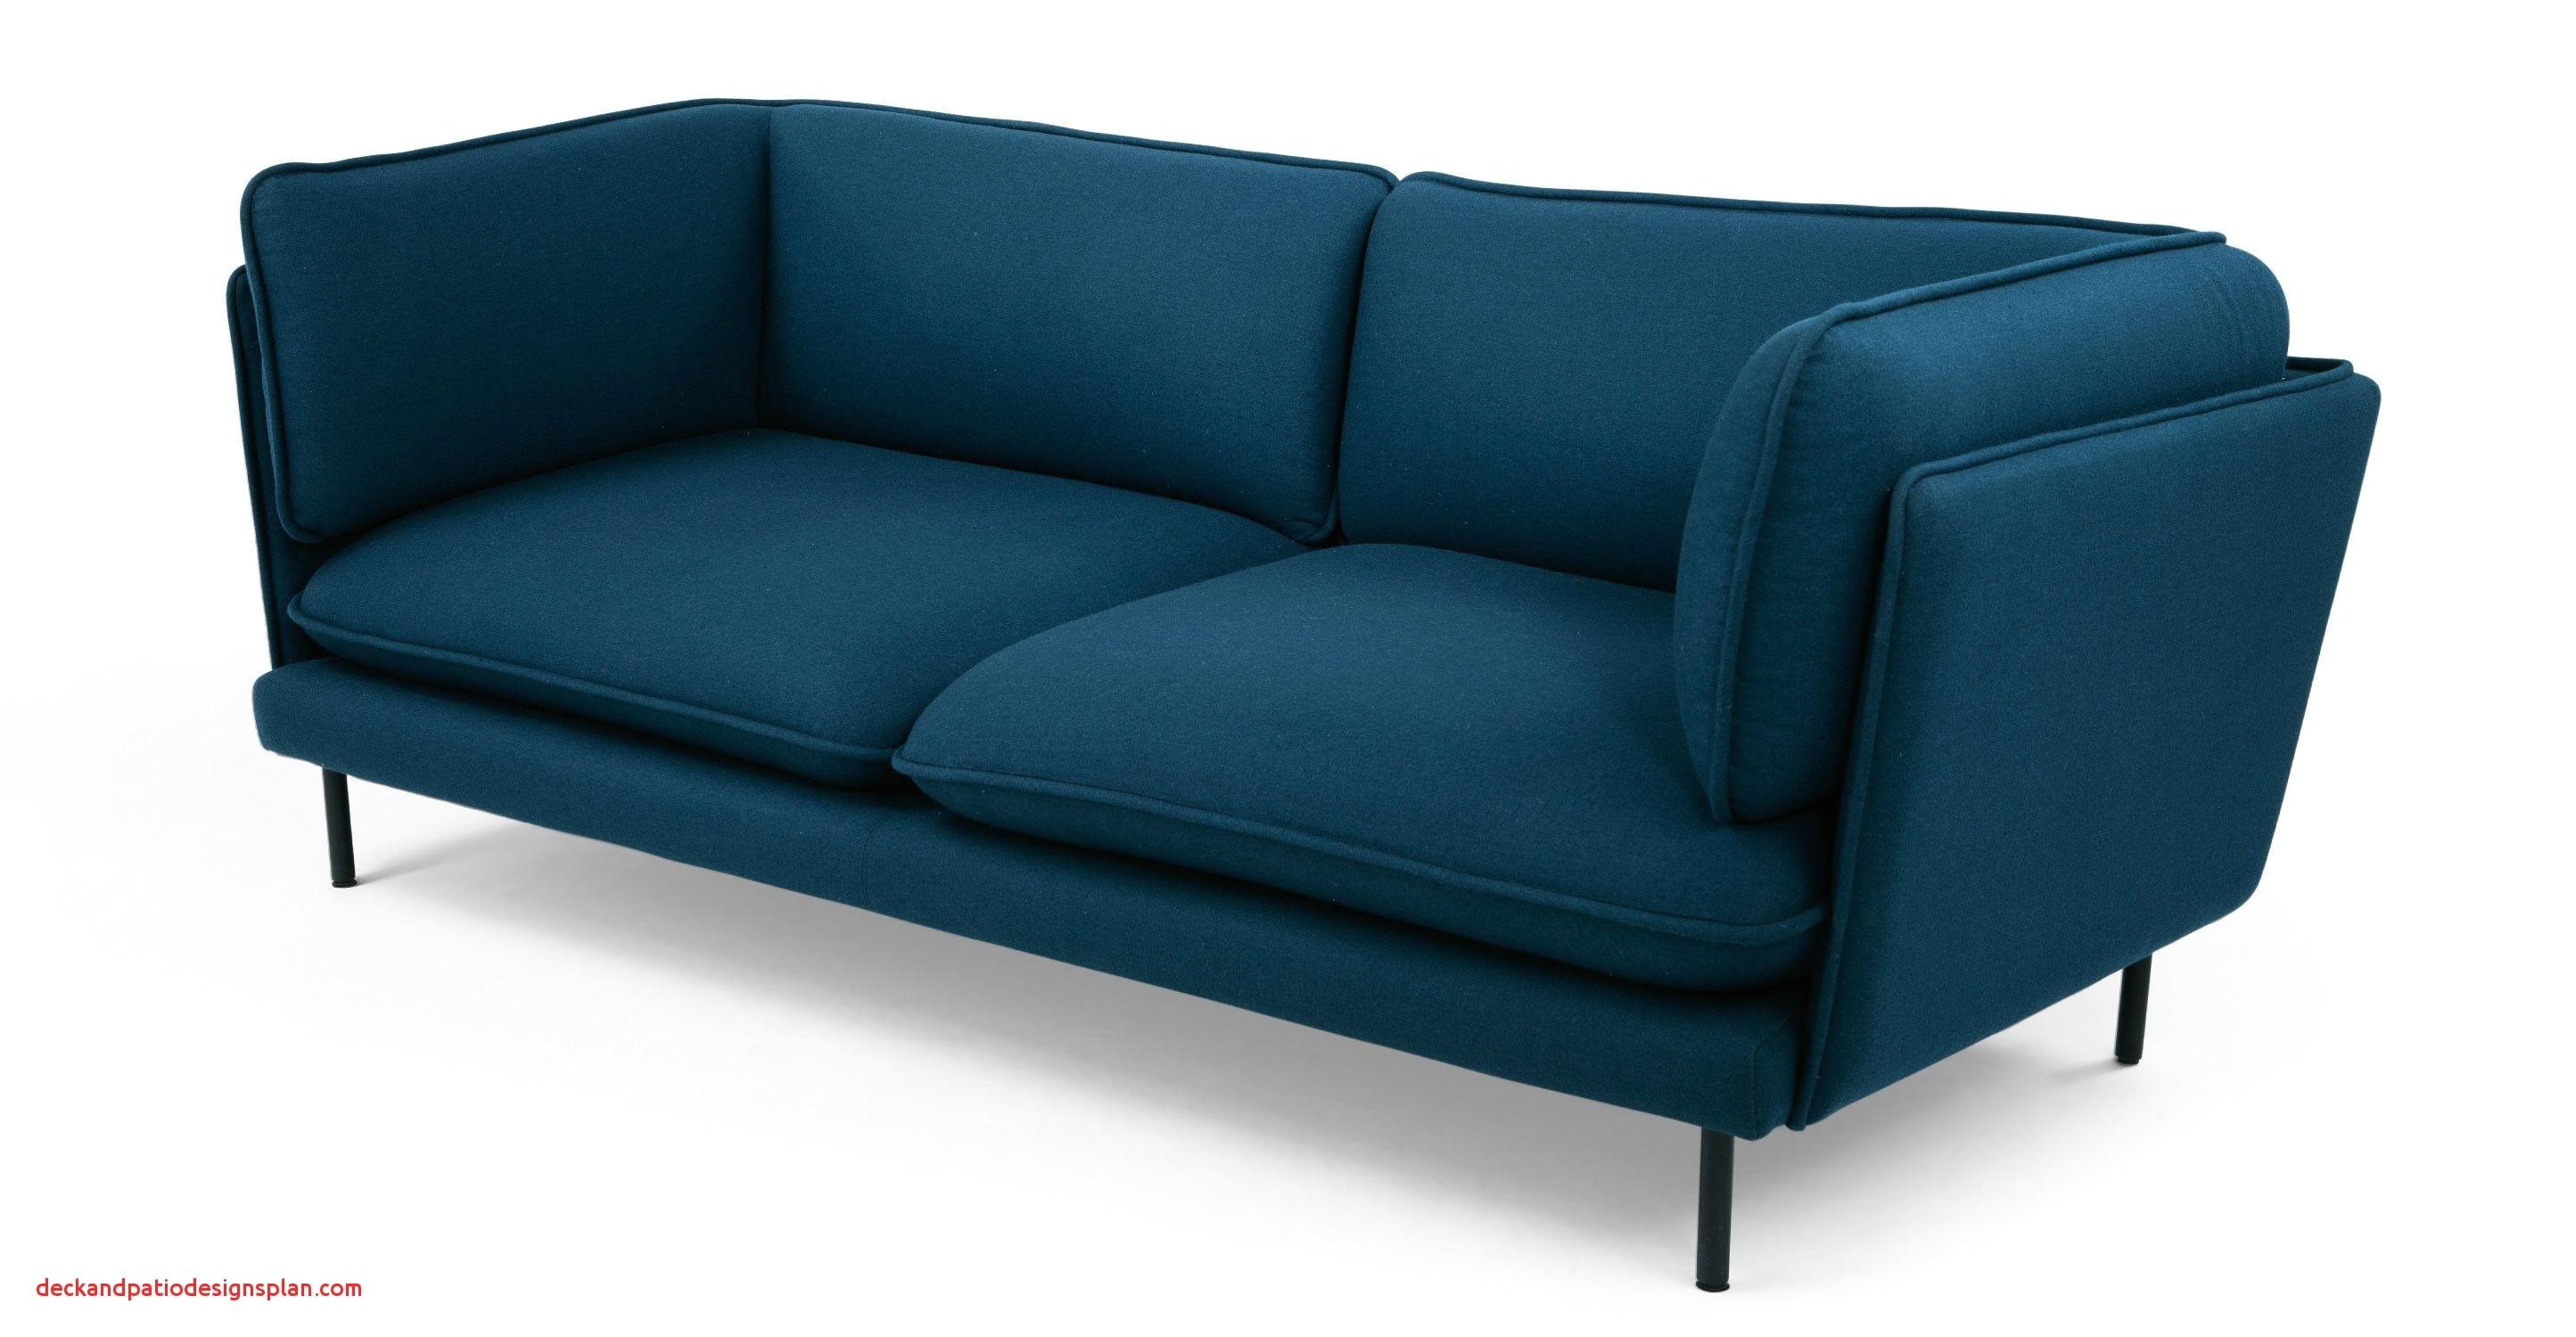 ikea schlafsofa solsta einzigartig ikea ecksofa mit perfect sofa ikea interior unique microfiber sofa foto